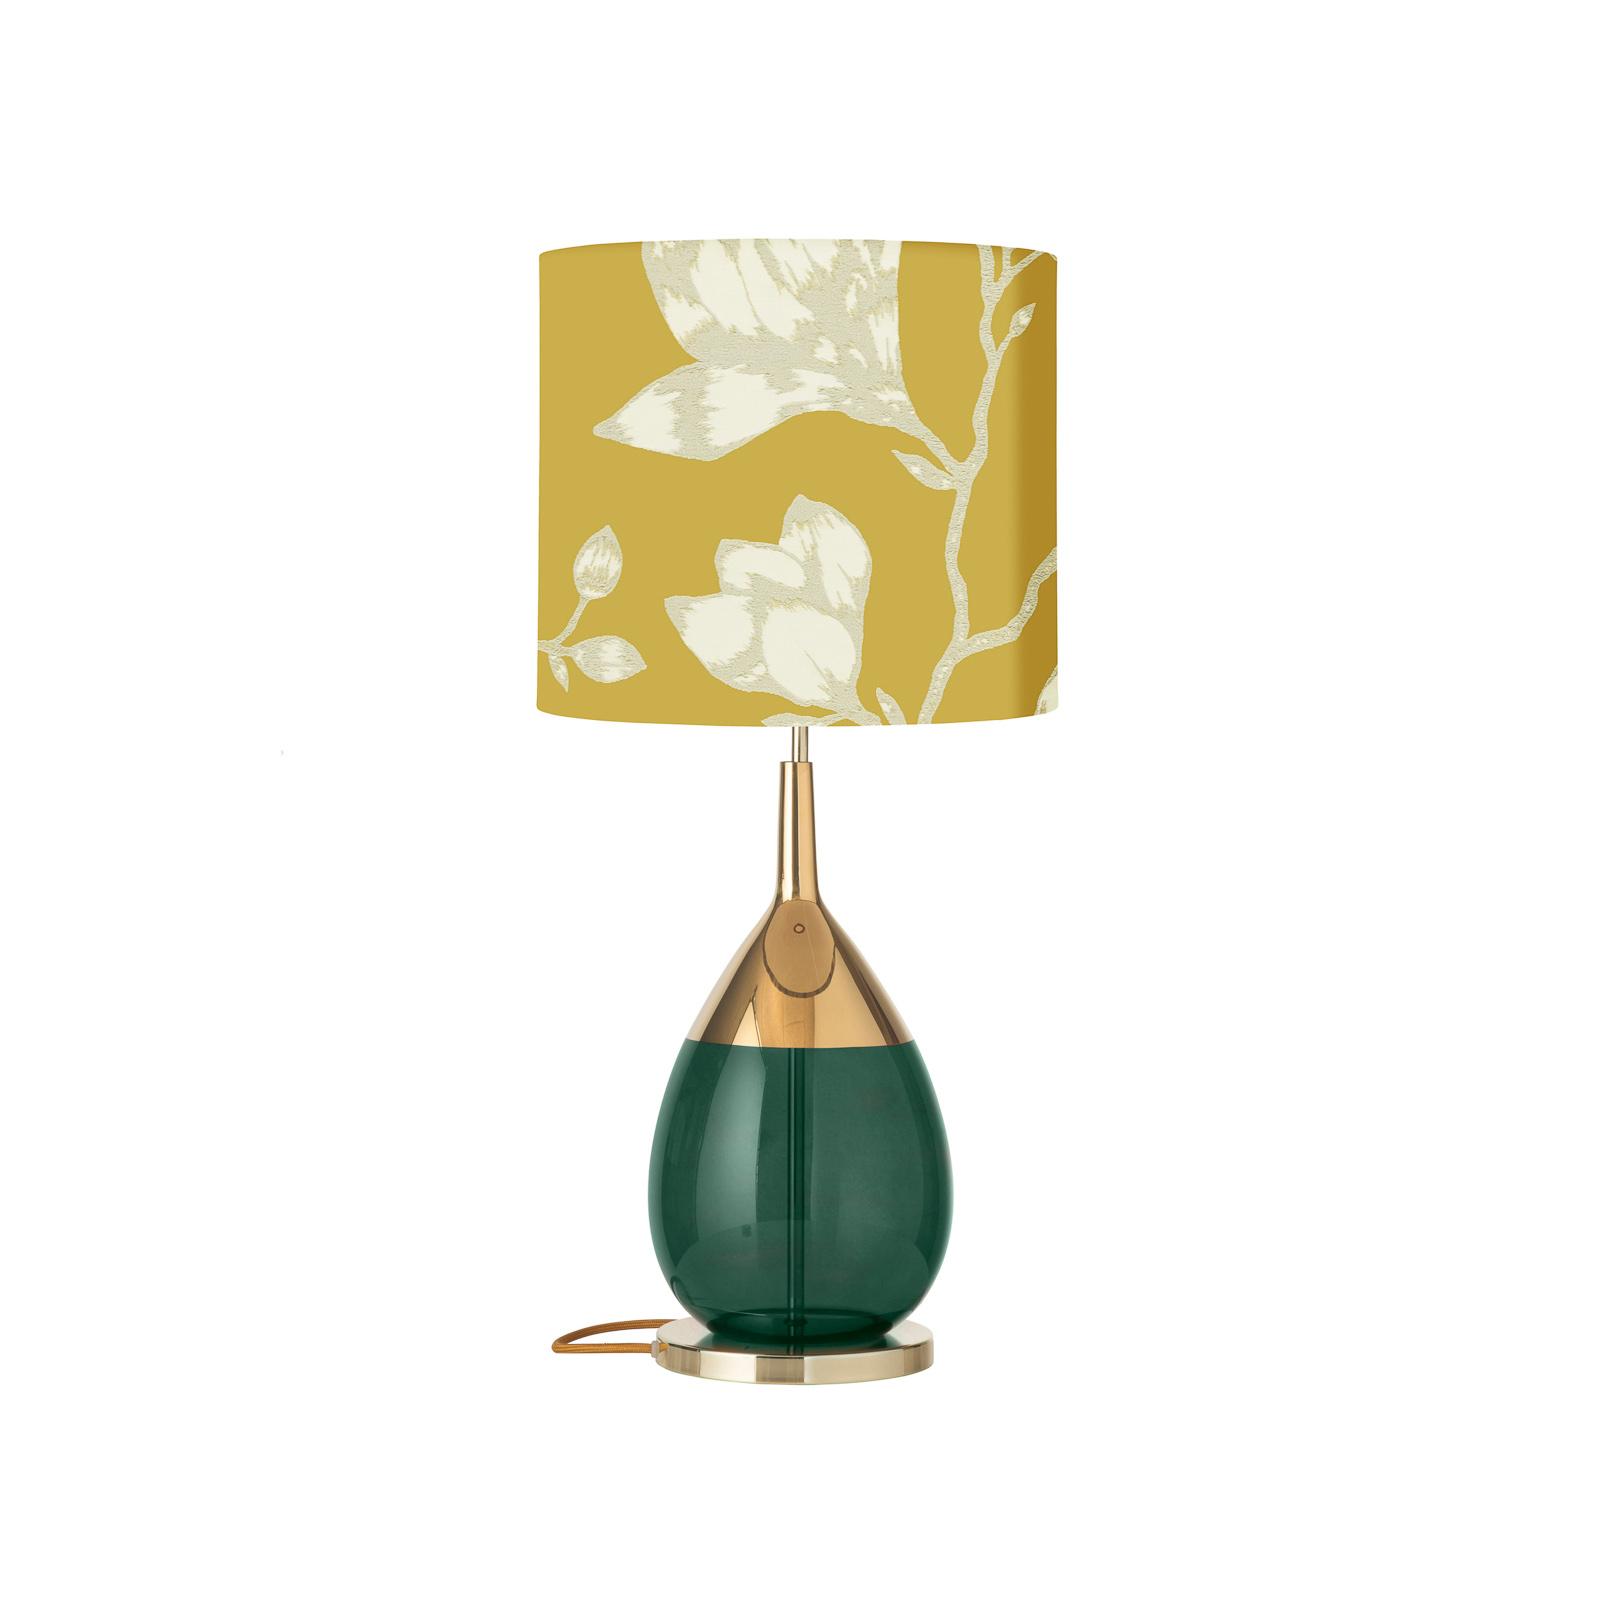 EBB & FLOW Lute Lustica bordlampe, safran/grøn